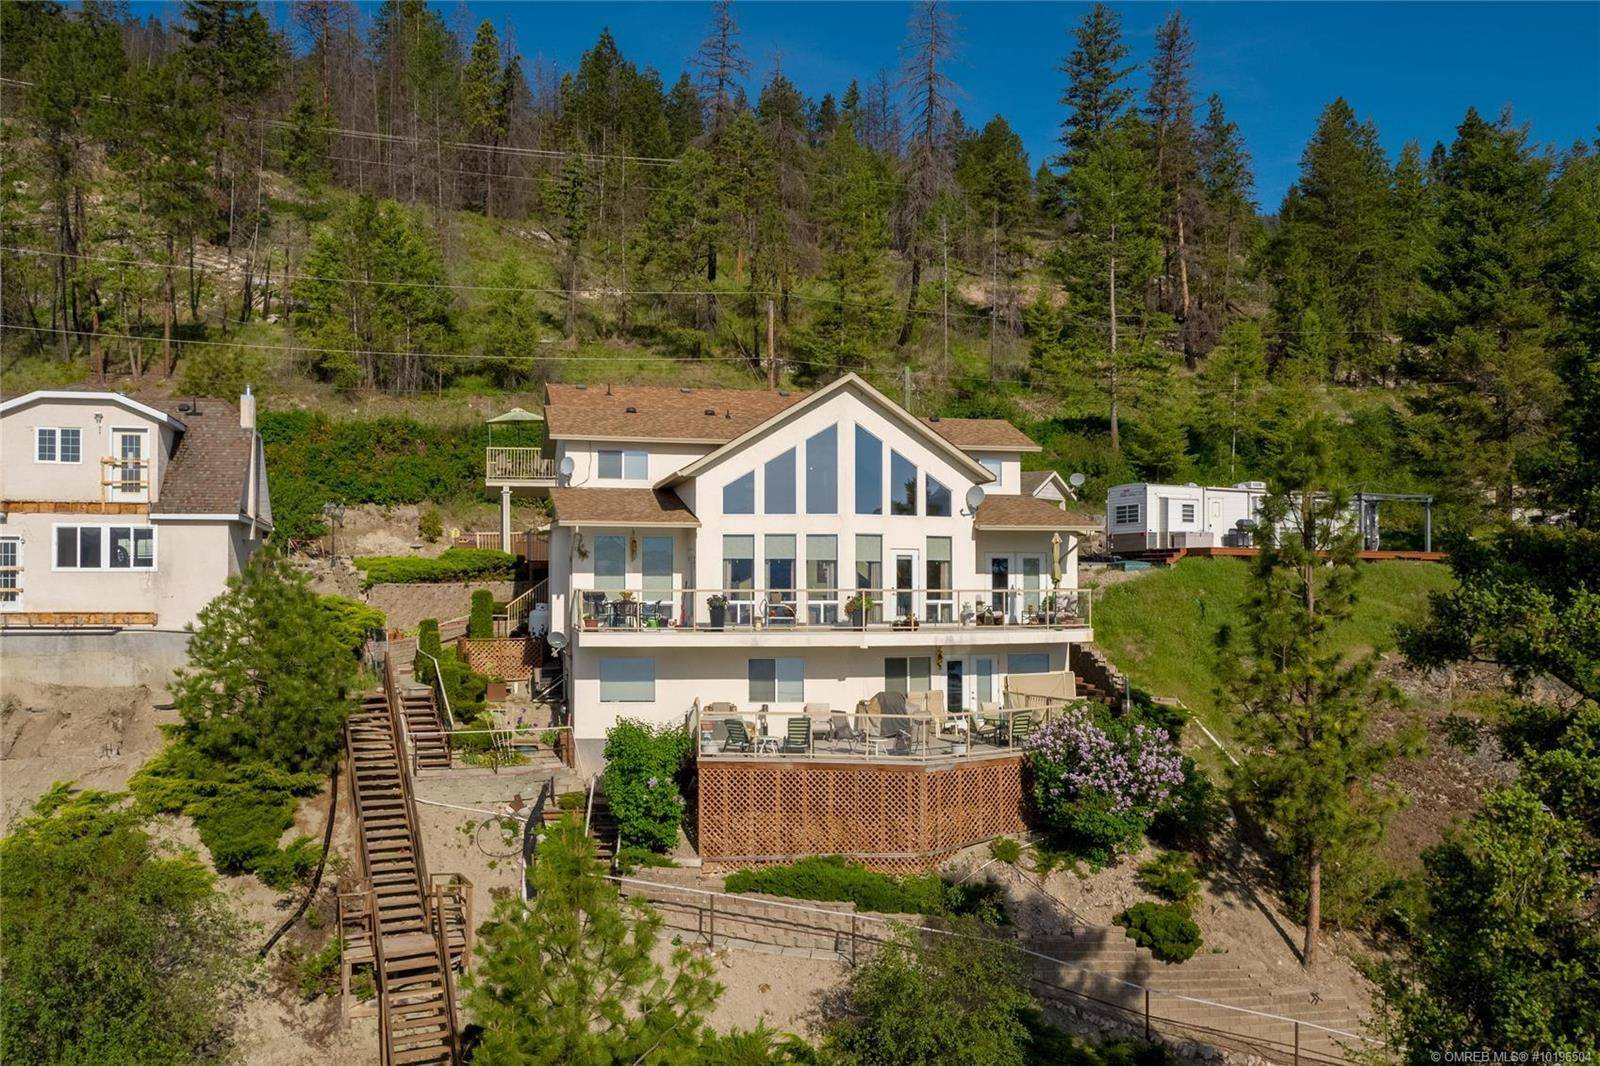 House for sale at 4401 Westside Rd North Unit 8 Kelowna British Columbia - MLS: 10196504